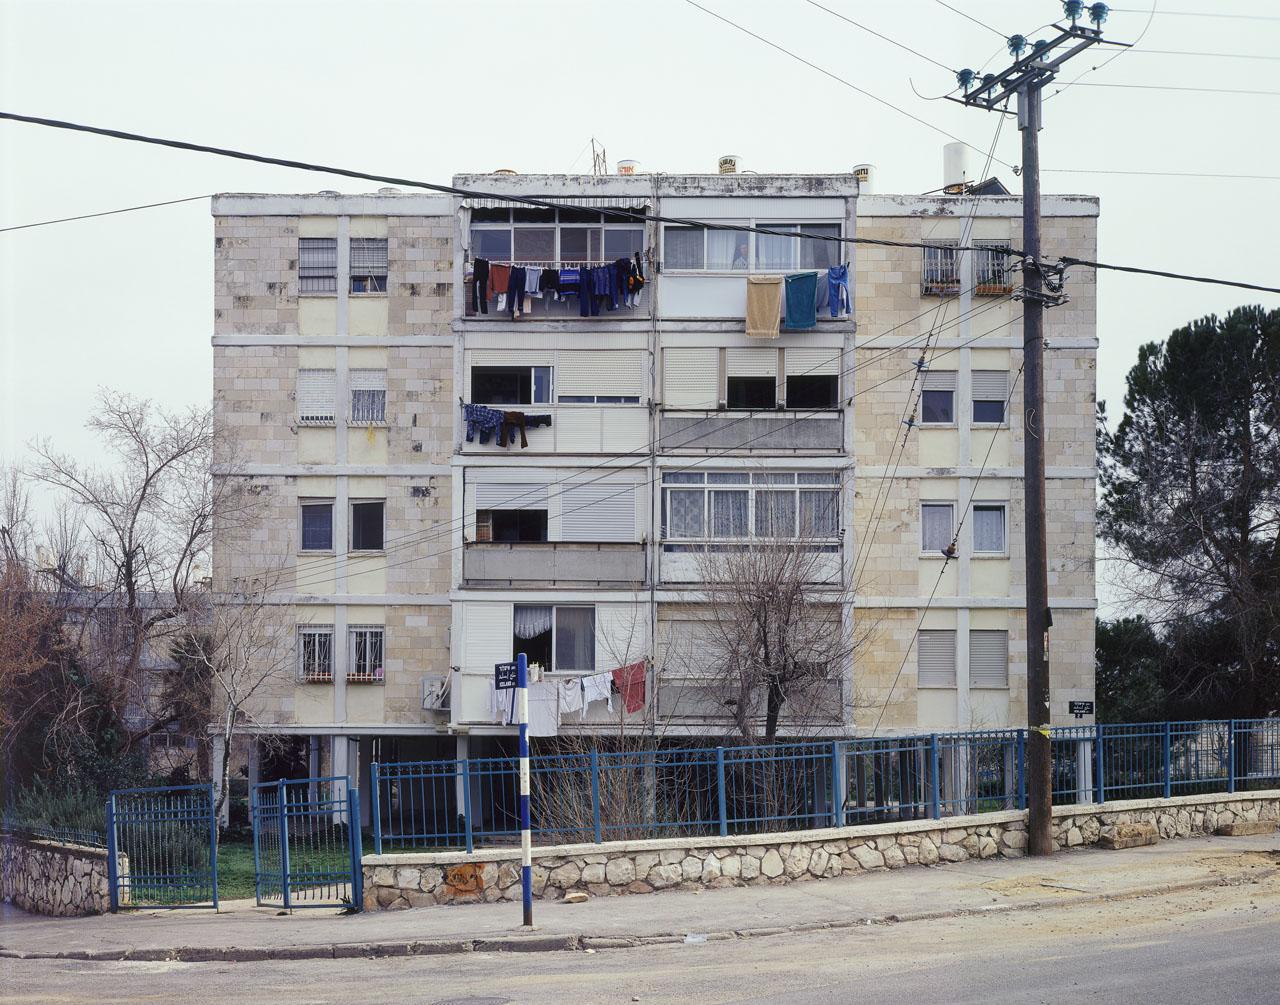 yaakovisraelswj43